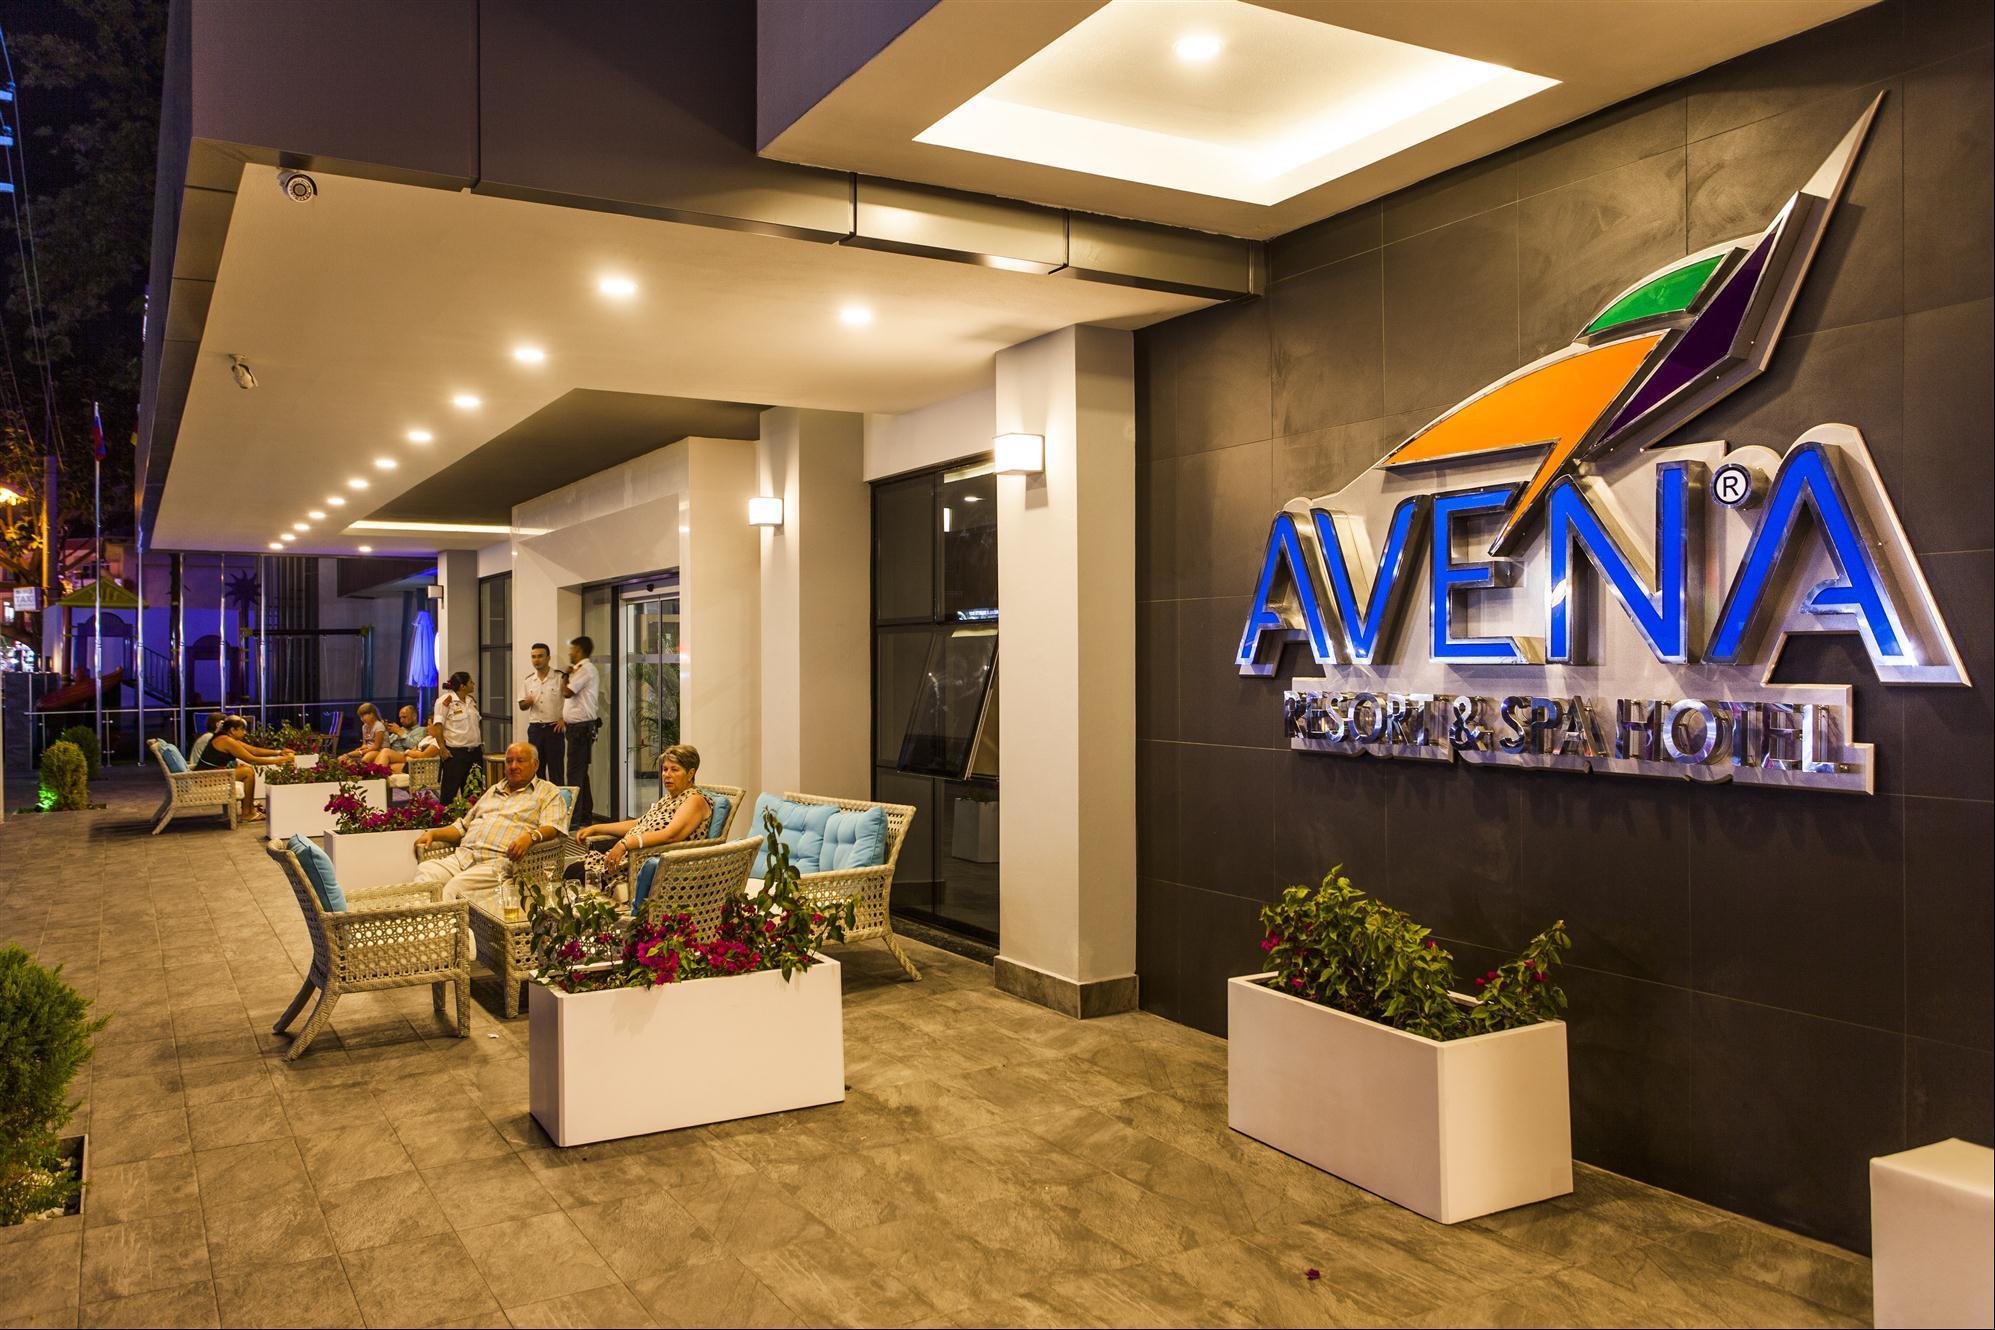 avena-resort-spa-hotel-ex-gold-safran-hotel-genel-002